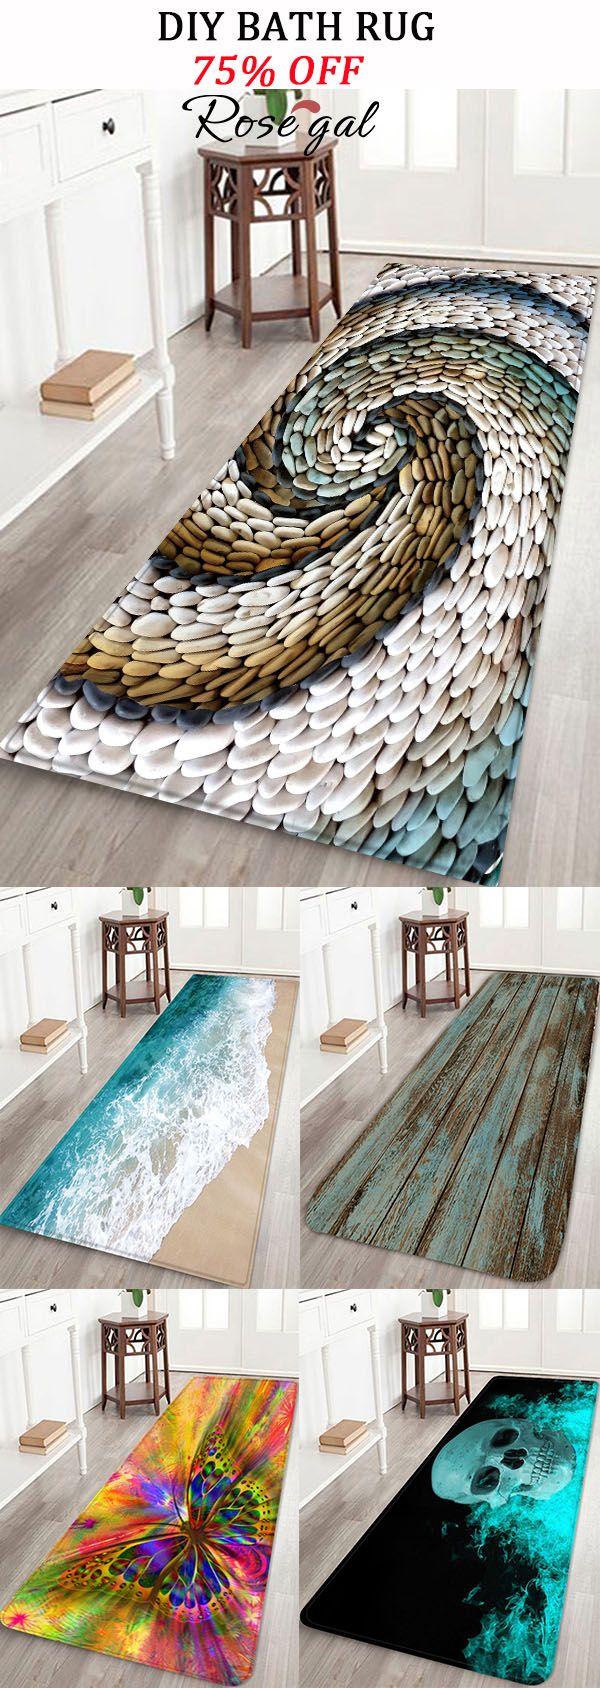 Diy Bath Rugs Ideas Bathroom Mat Rosegal Homedecor Diy Bath Rug Floor Rugs Bath Rugs [ 1688 x 600 Pixel ]